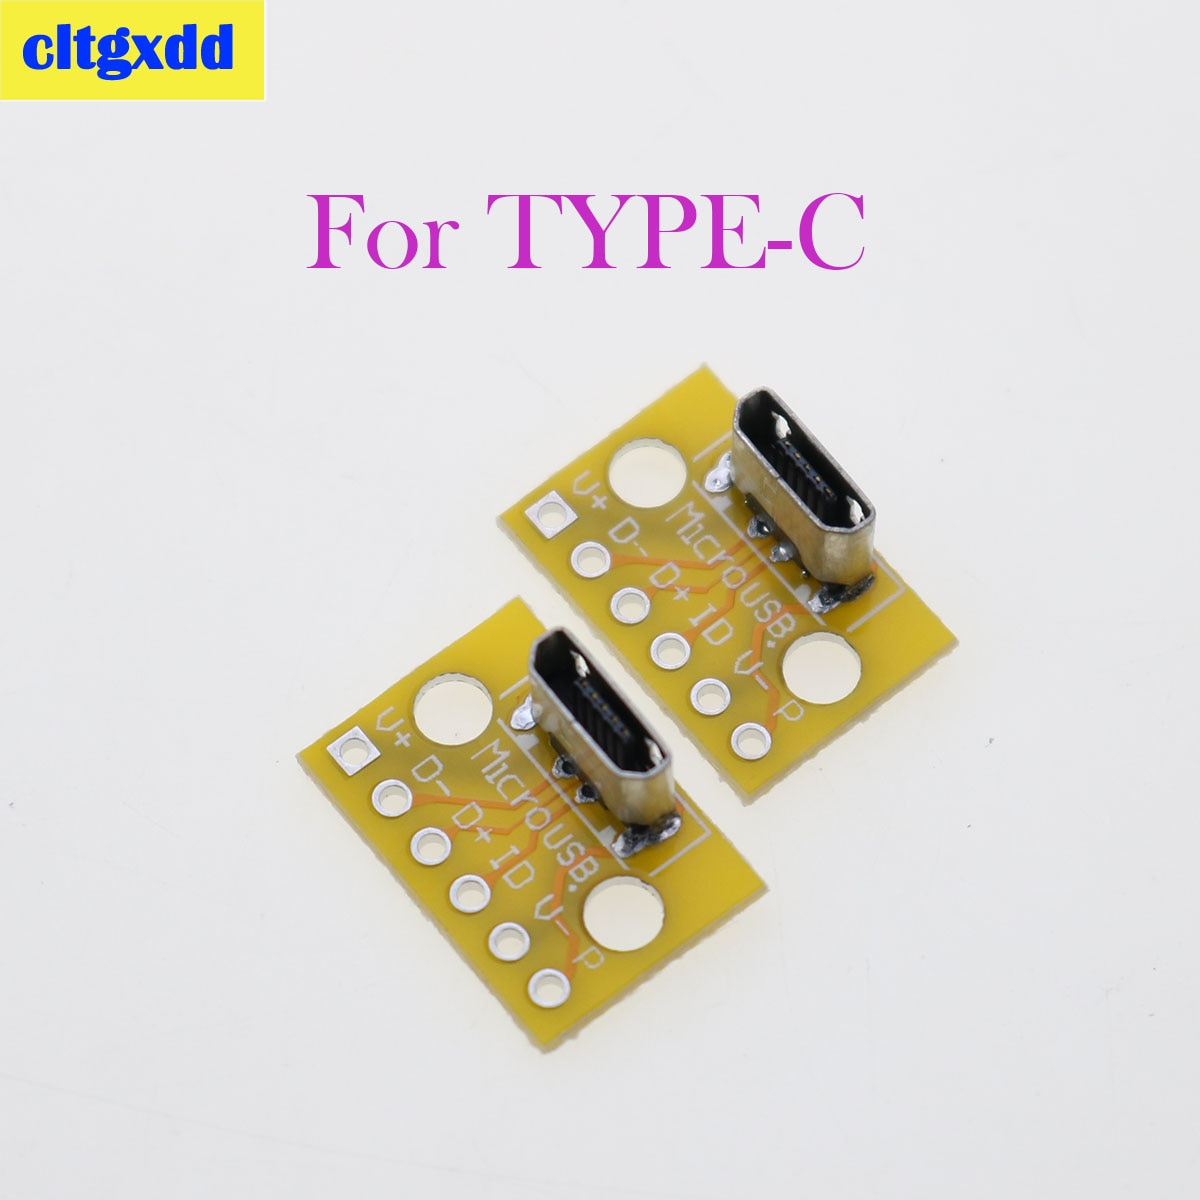 Cltgxdd 20 piezas MicroUSB USB Vertical tipo C Conector de cabeza macho...